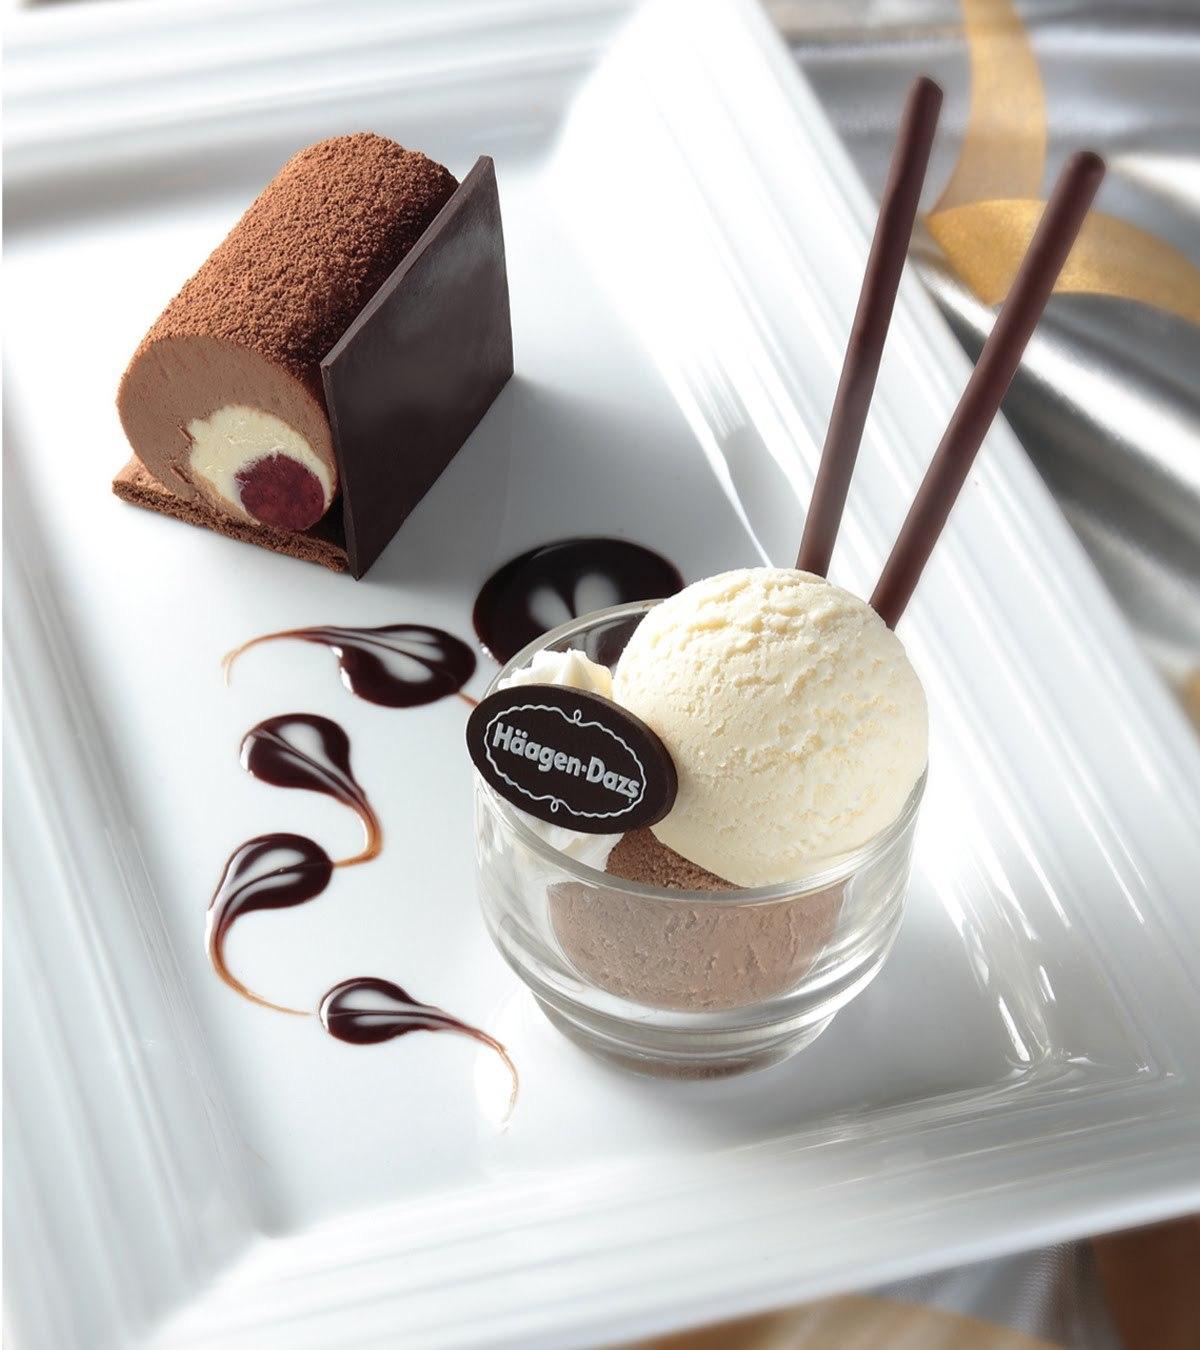 Ice-Cream, Chocolate, Haagen Dazs